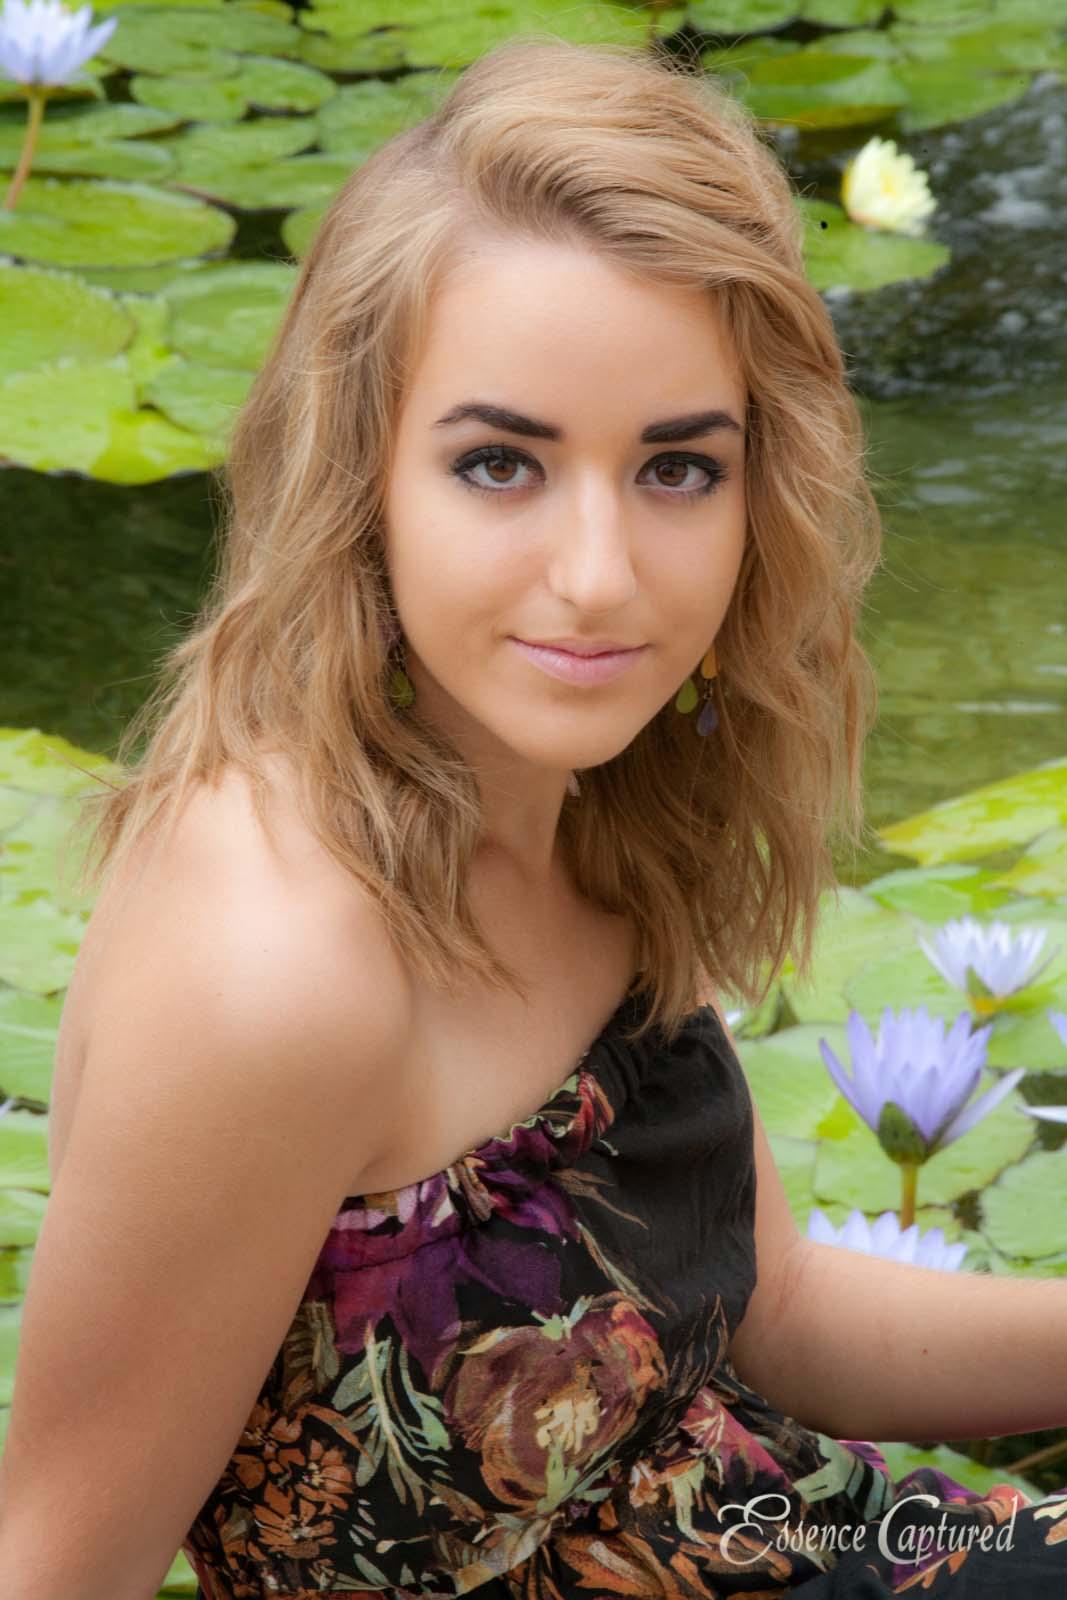 lily pads lotus flower high school senior portrait female